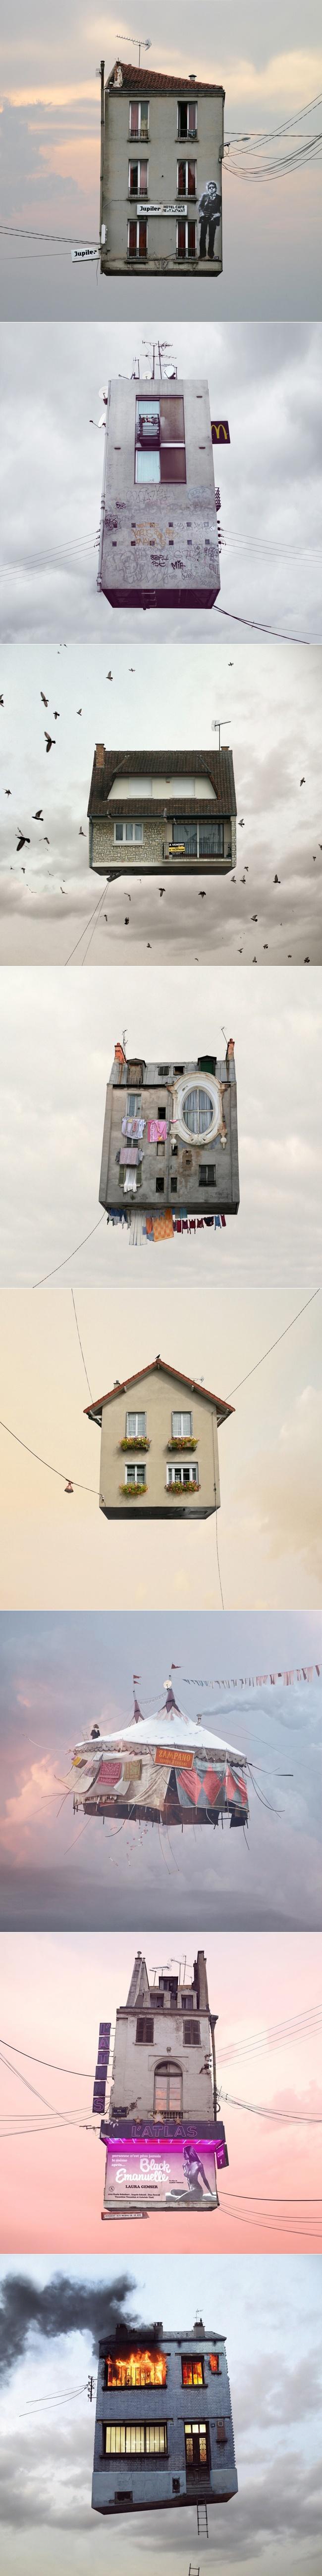 """Flying Houses"" - Fotoprojekt von Laurent Chehere"